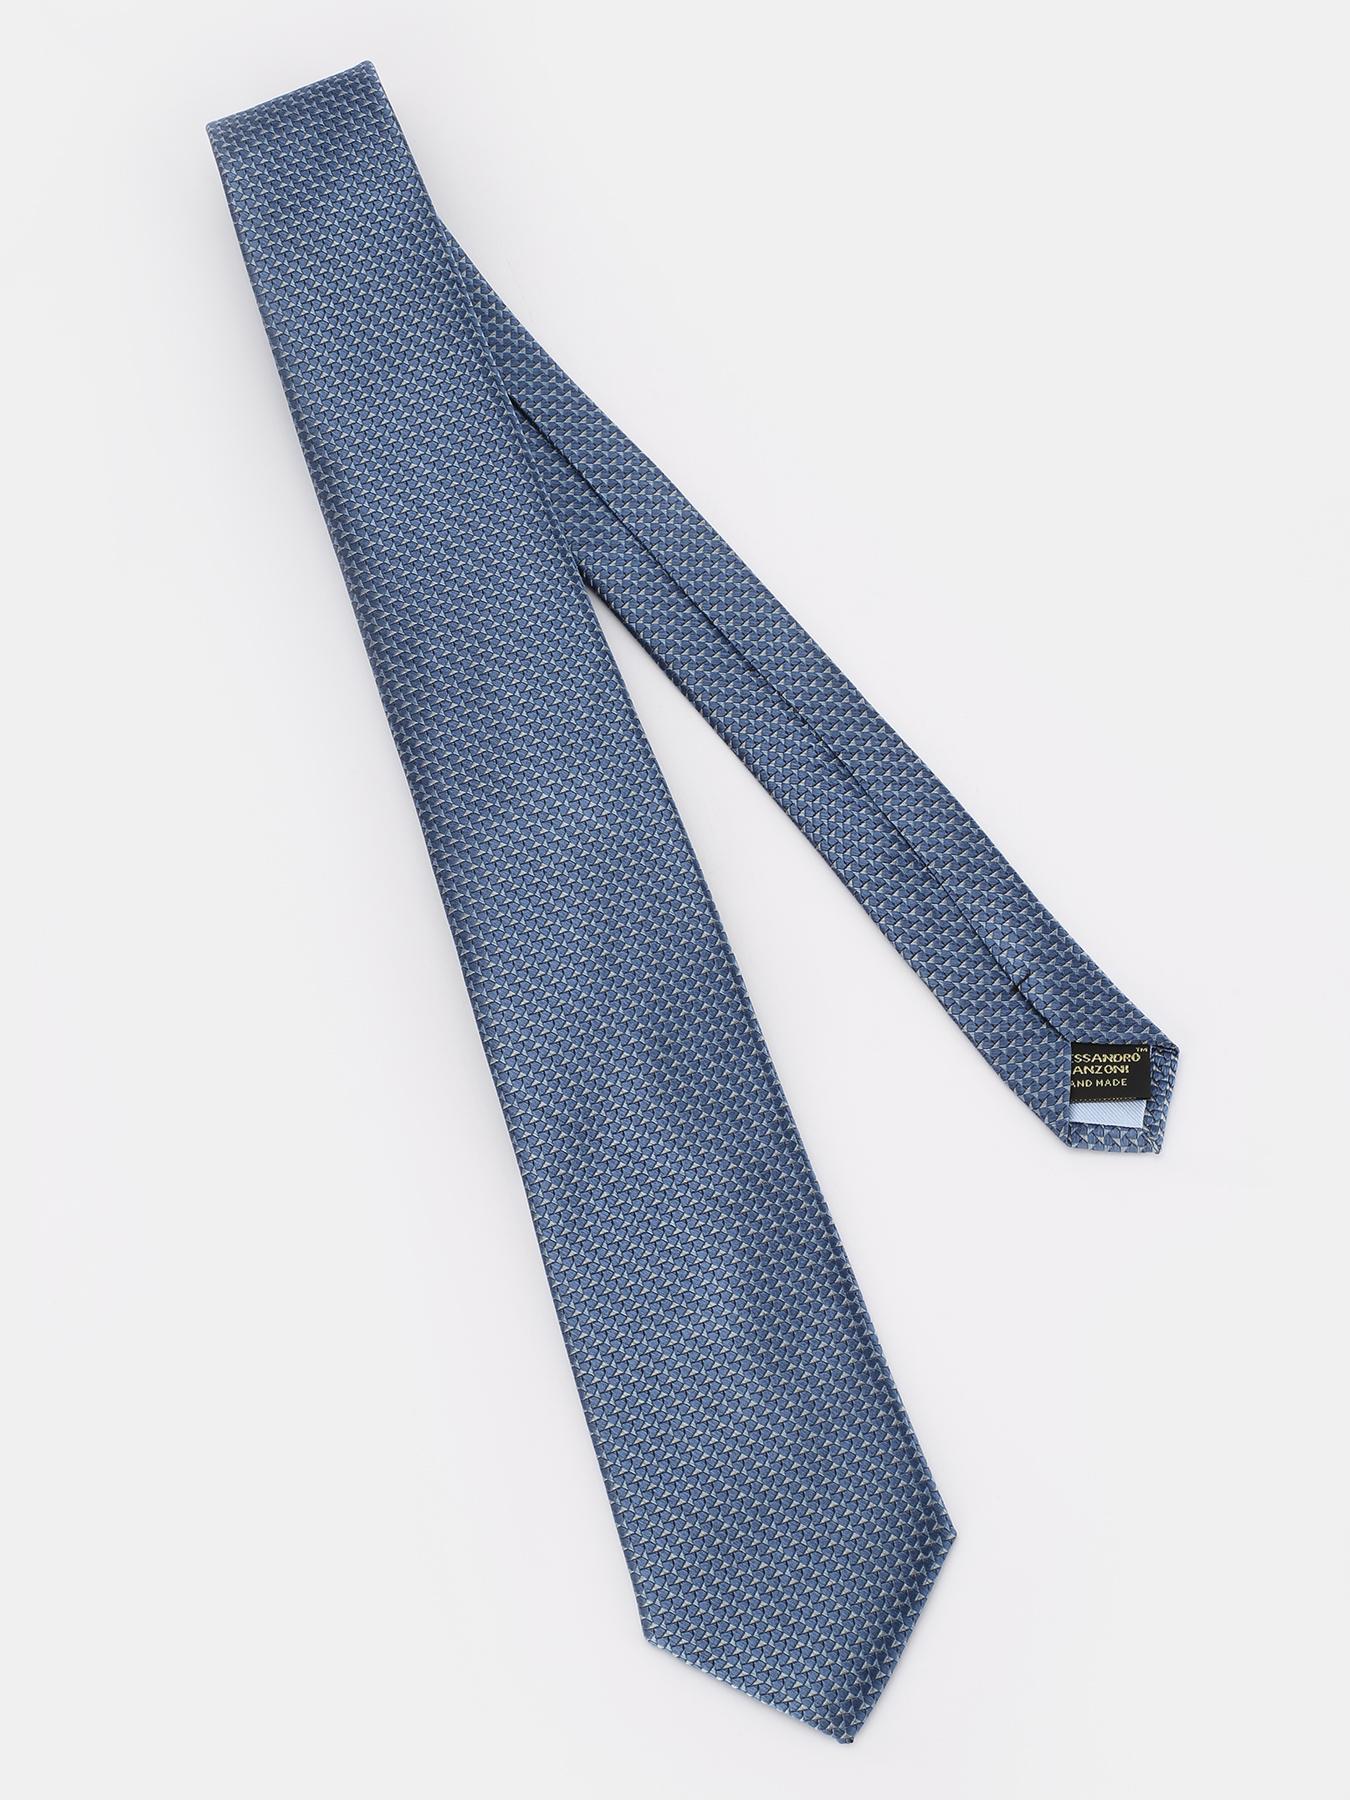 Alessandro Manzoni Шелковый галстук 312361-185 Фото 3